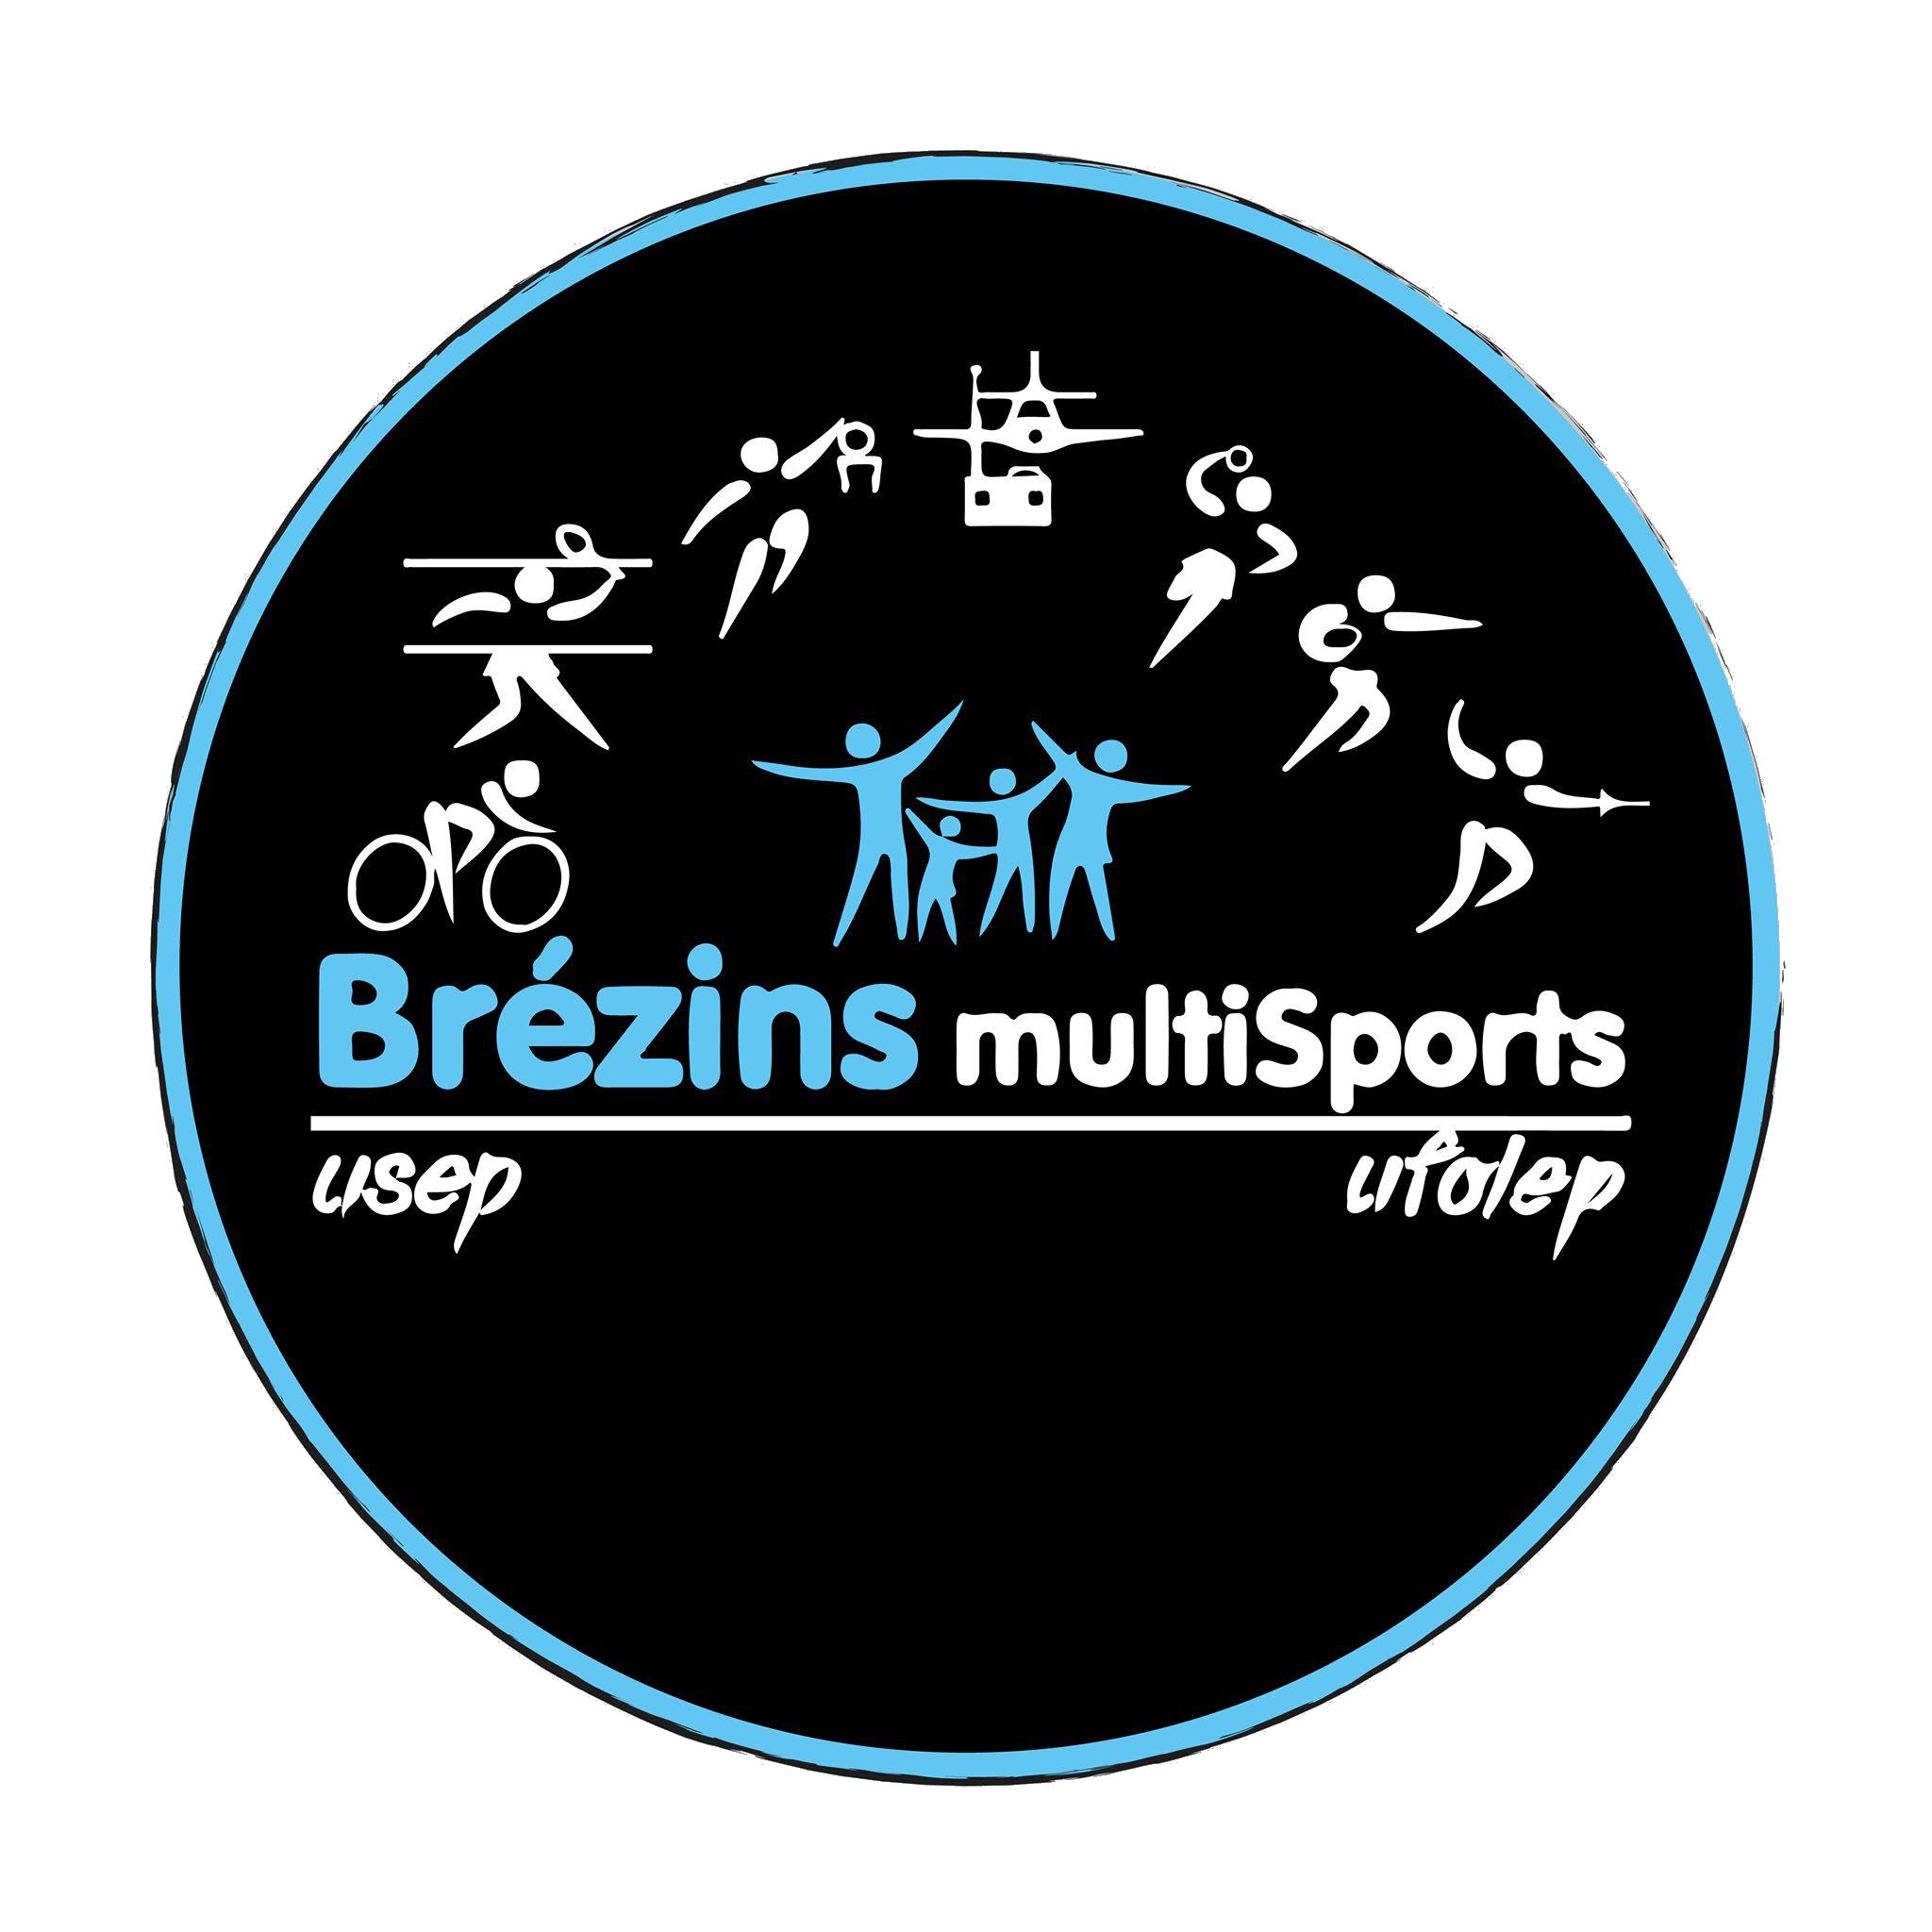 Brézins Multisports